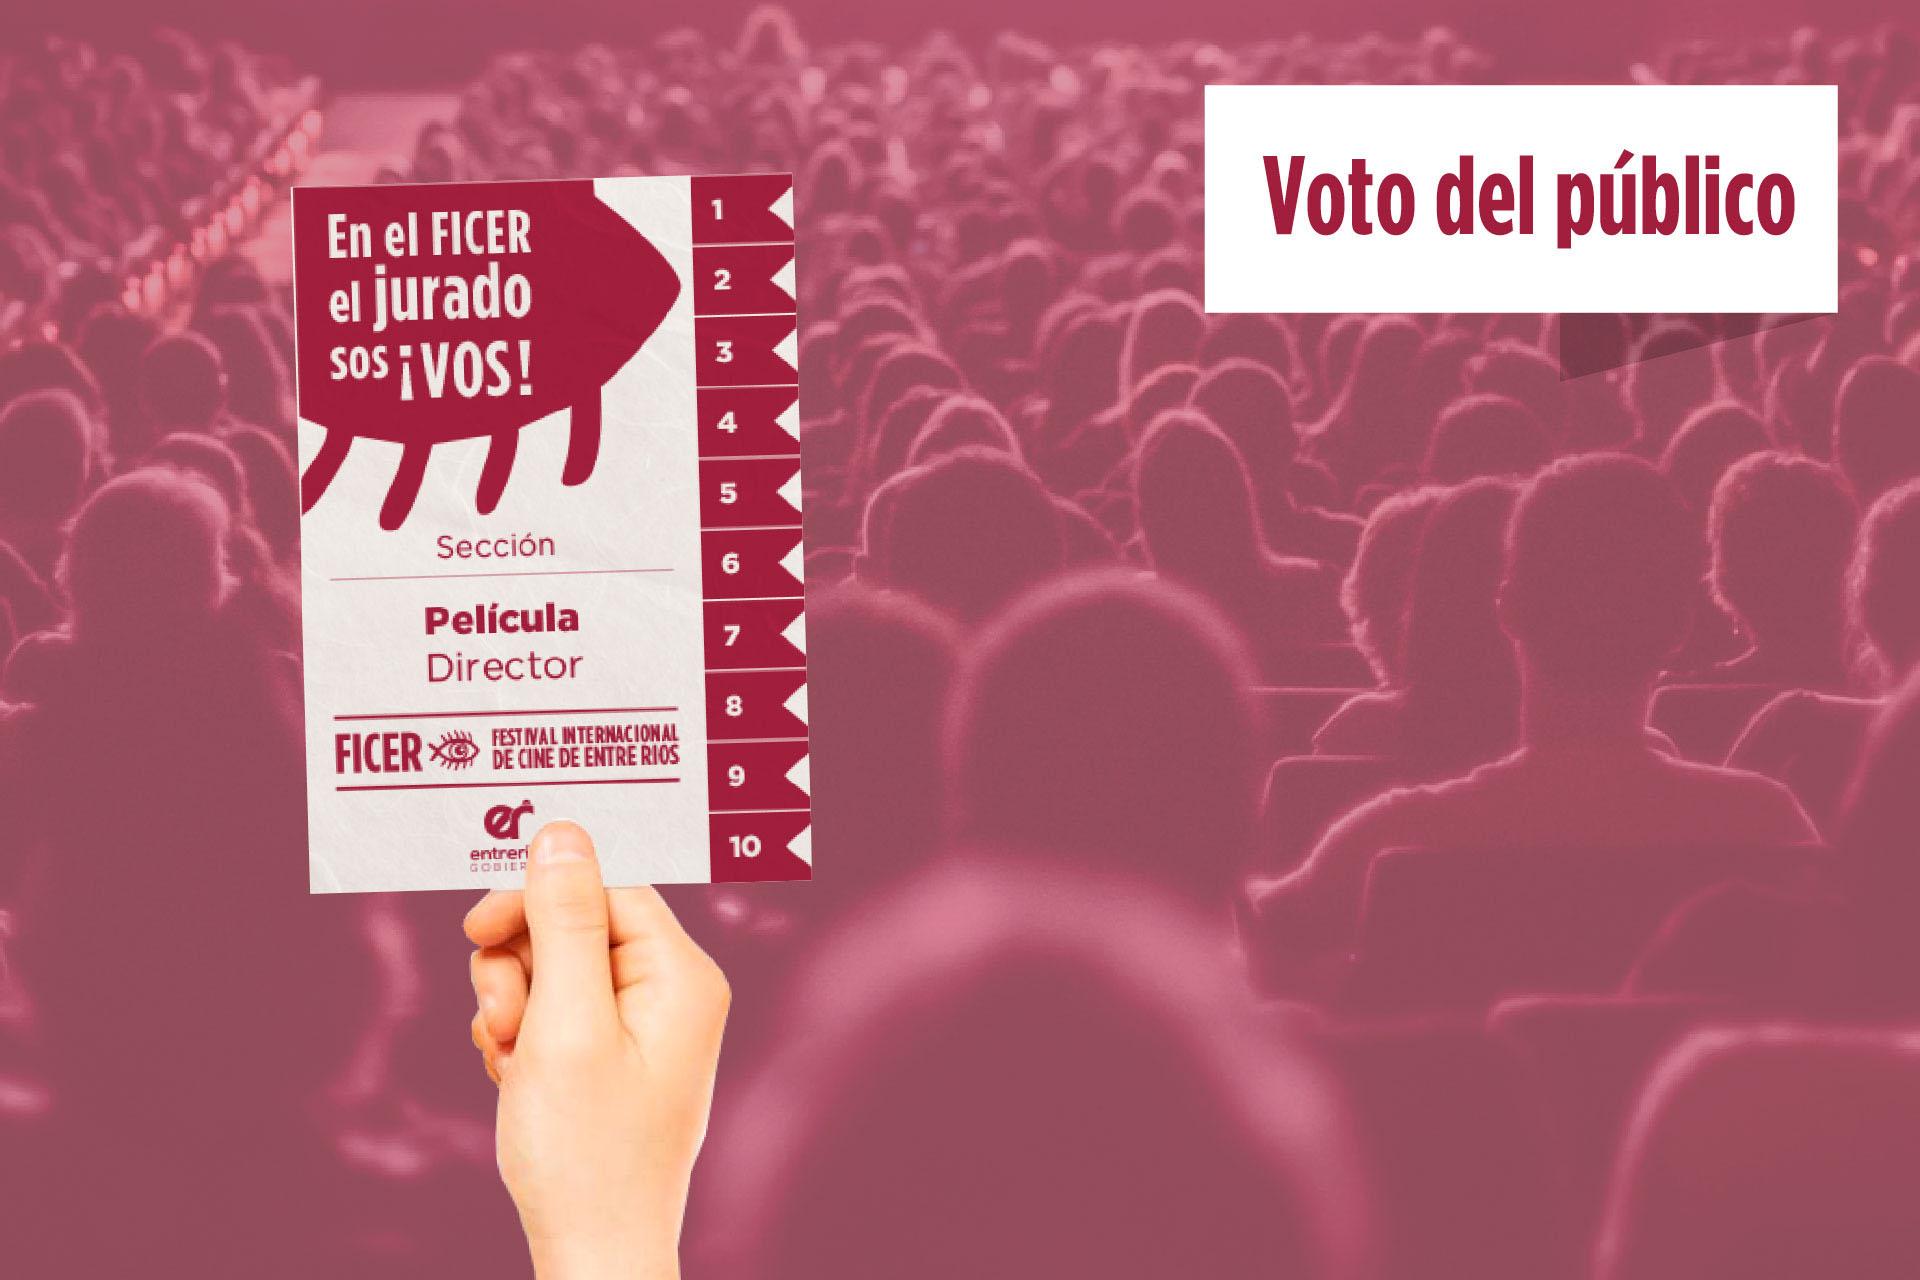 Festival Internacional de Cine de Entre Ríos